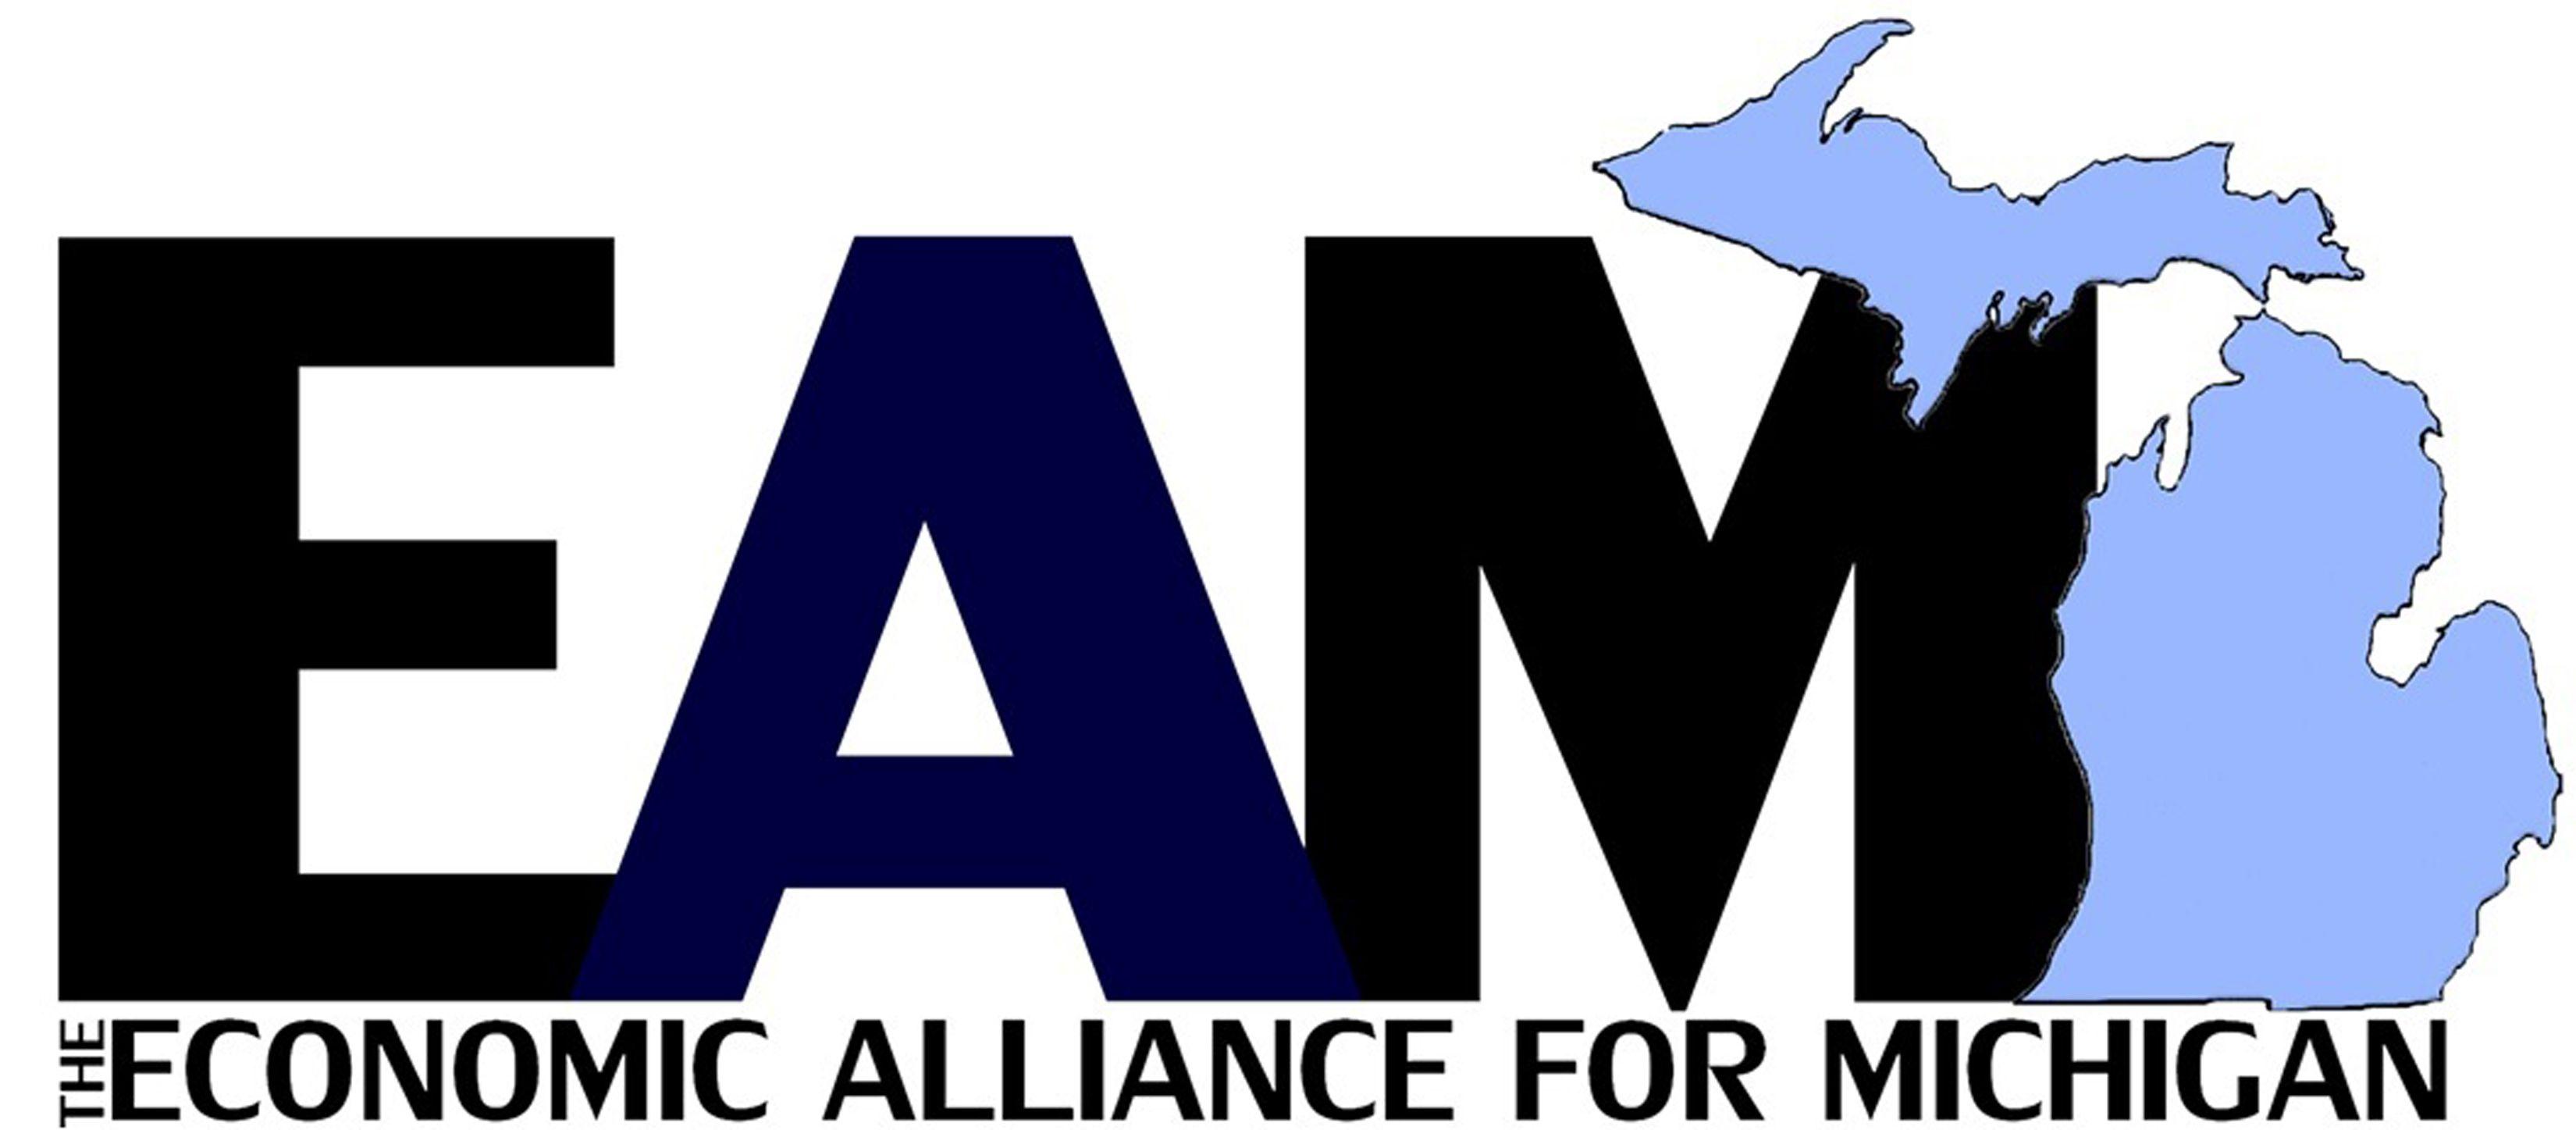 The Economic Alliance for Michigan logo